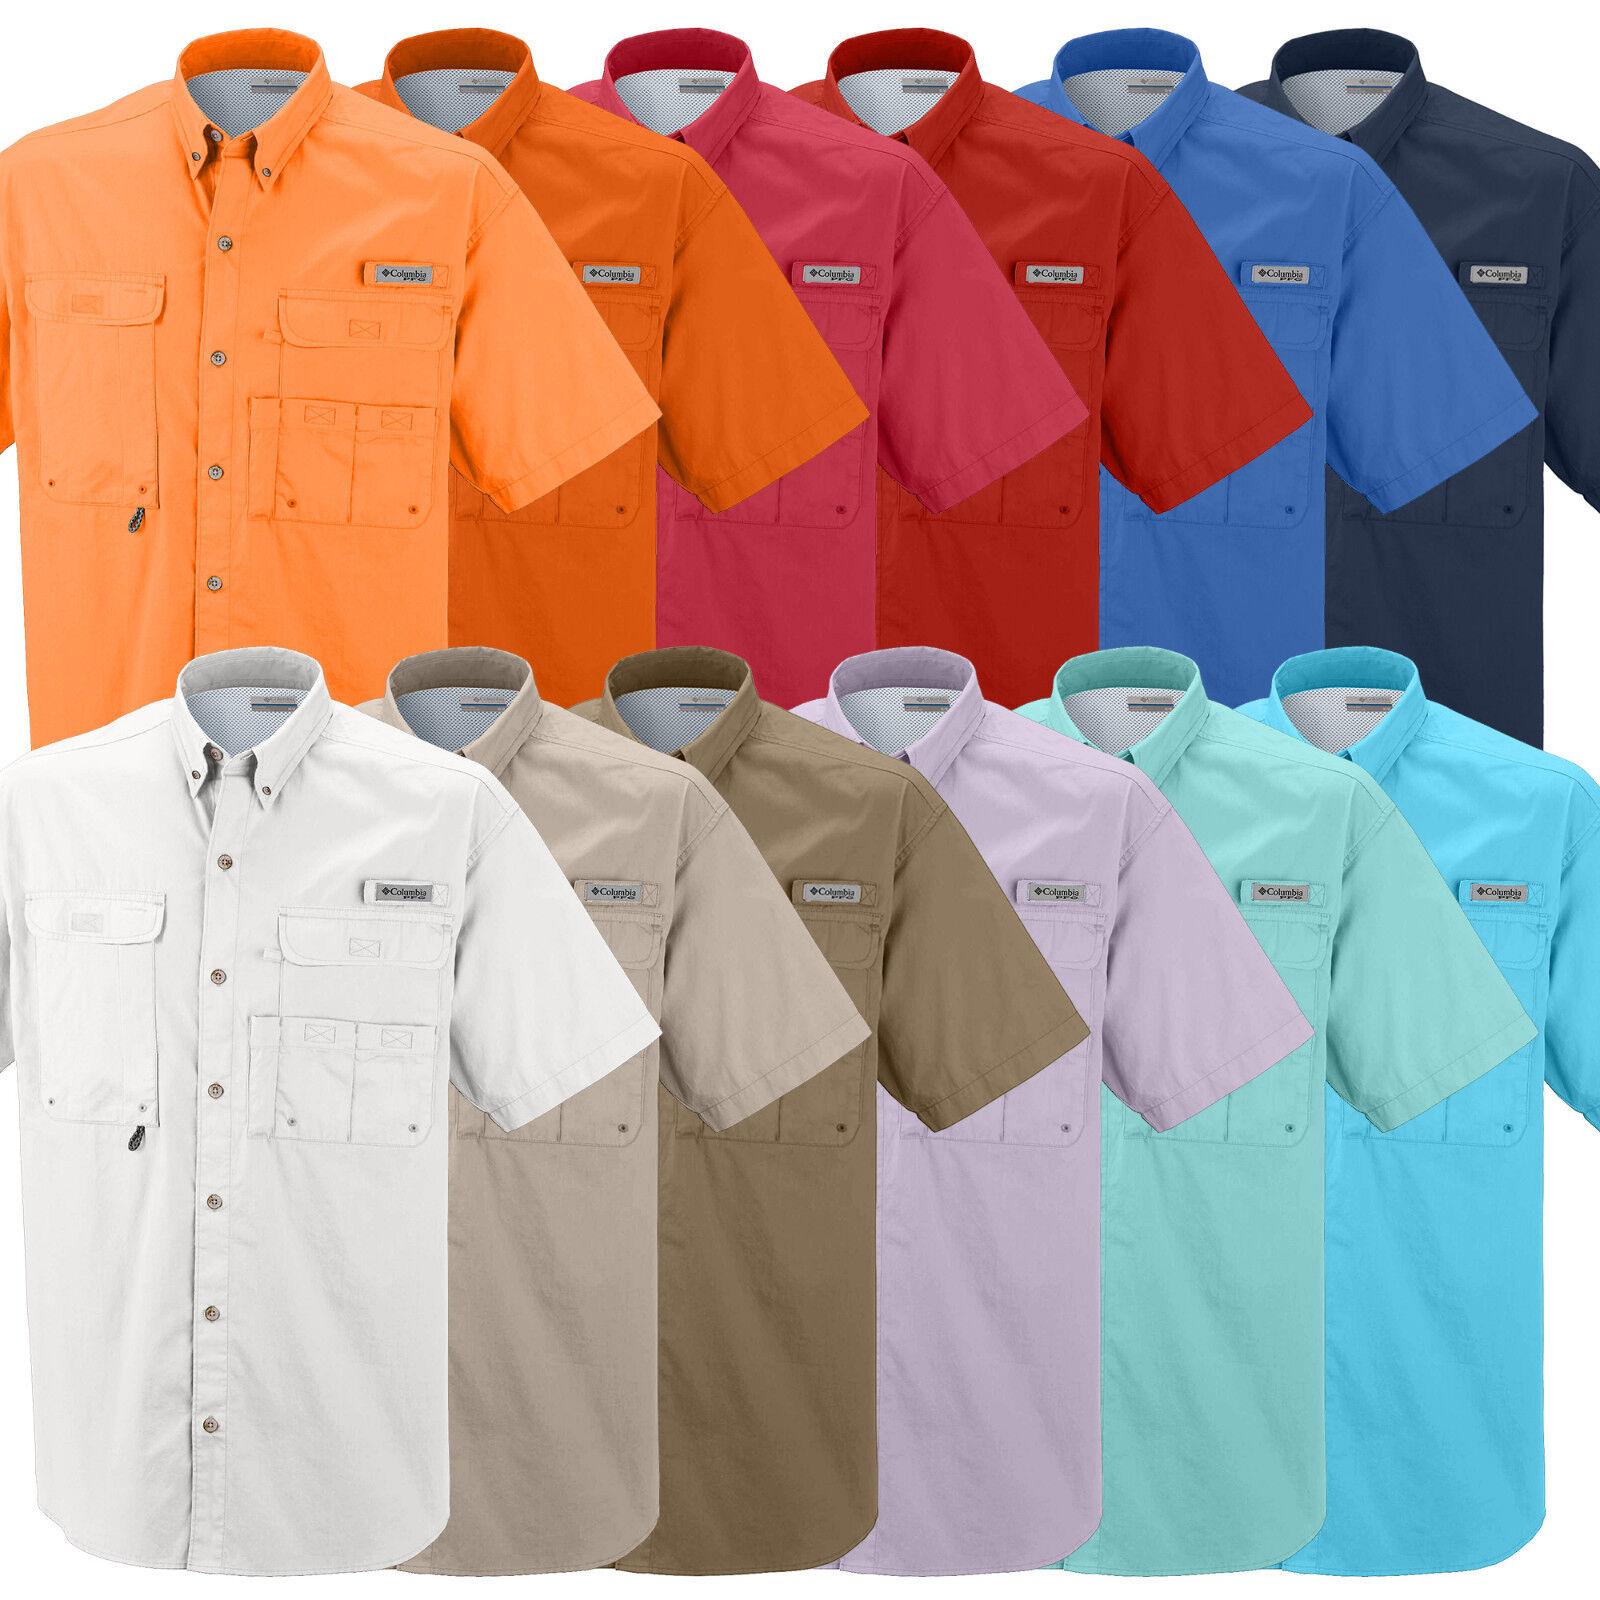 magellan angler shirt - HD1600×1600